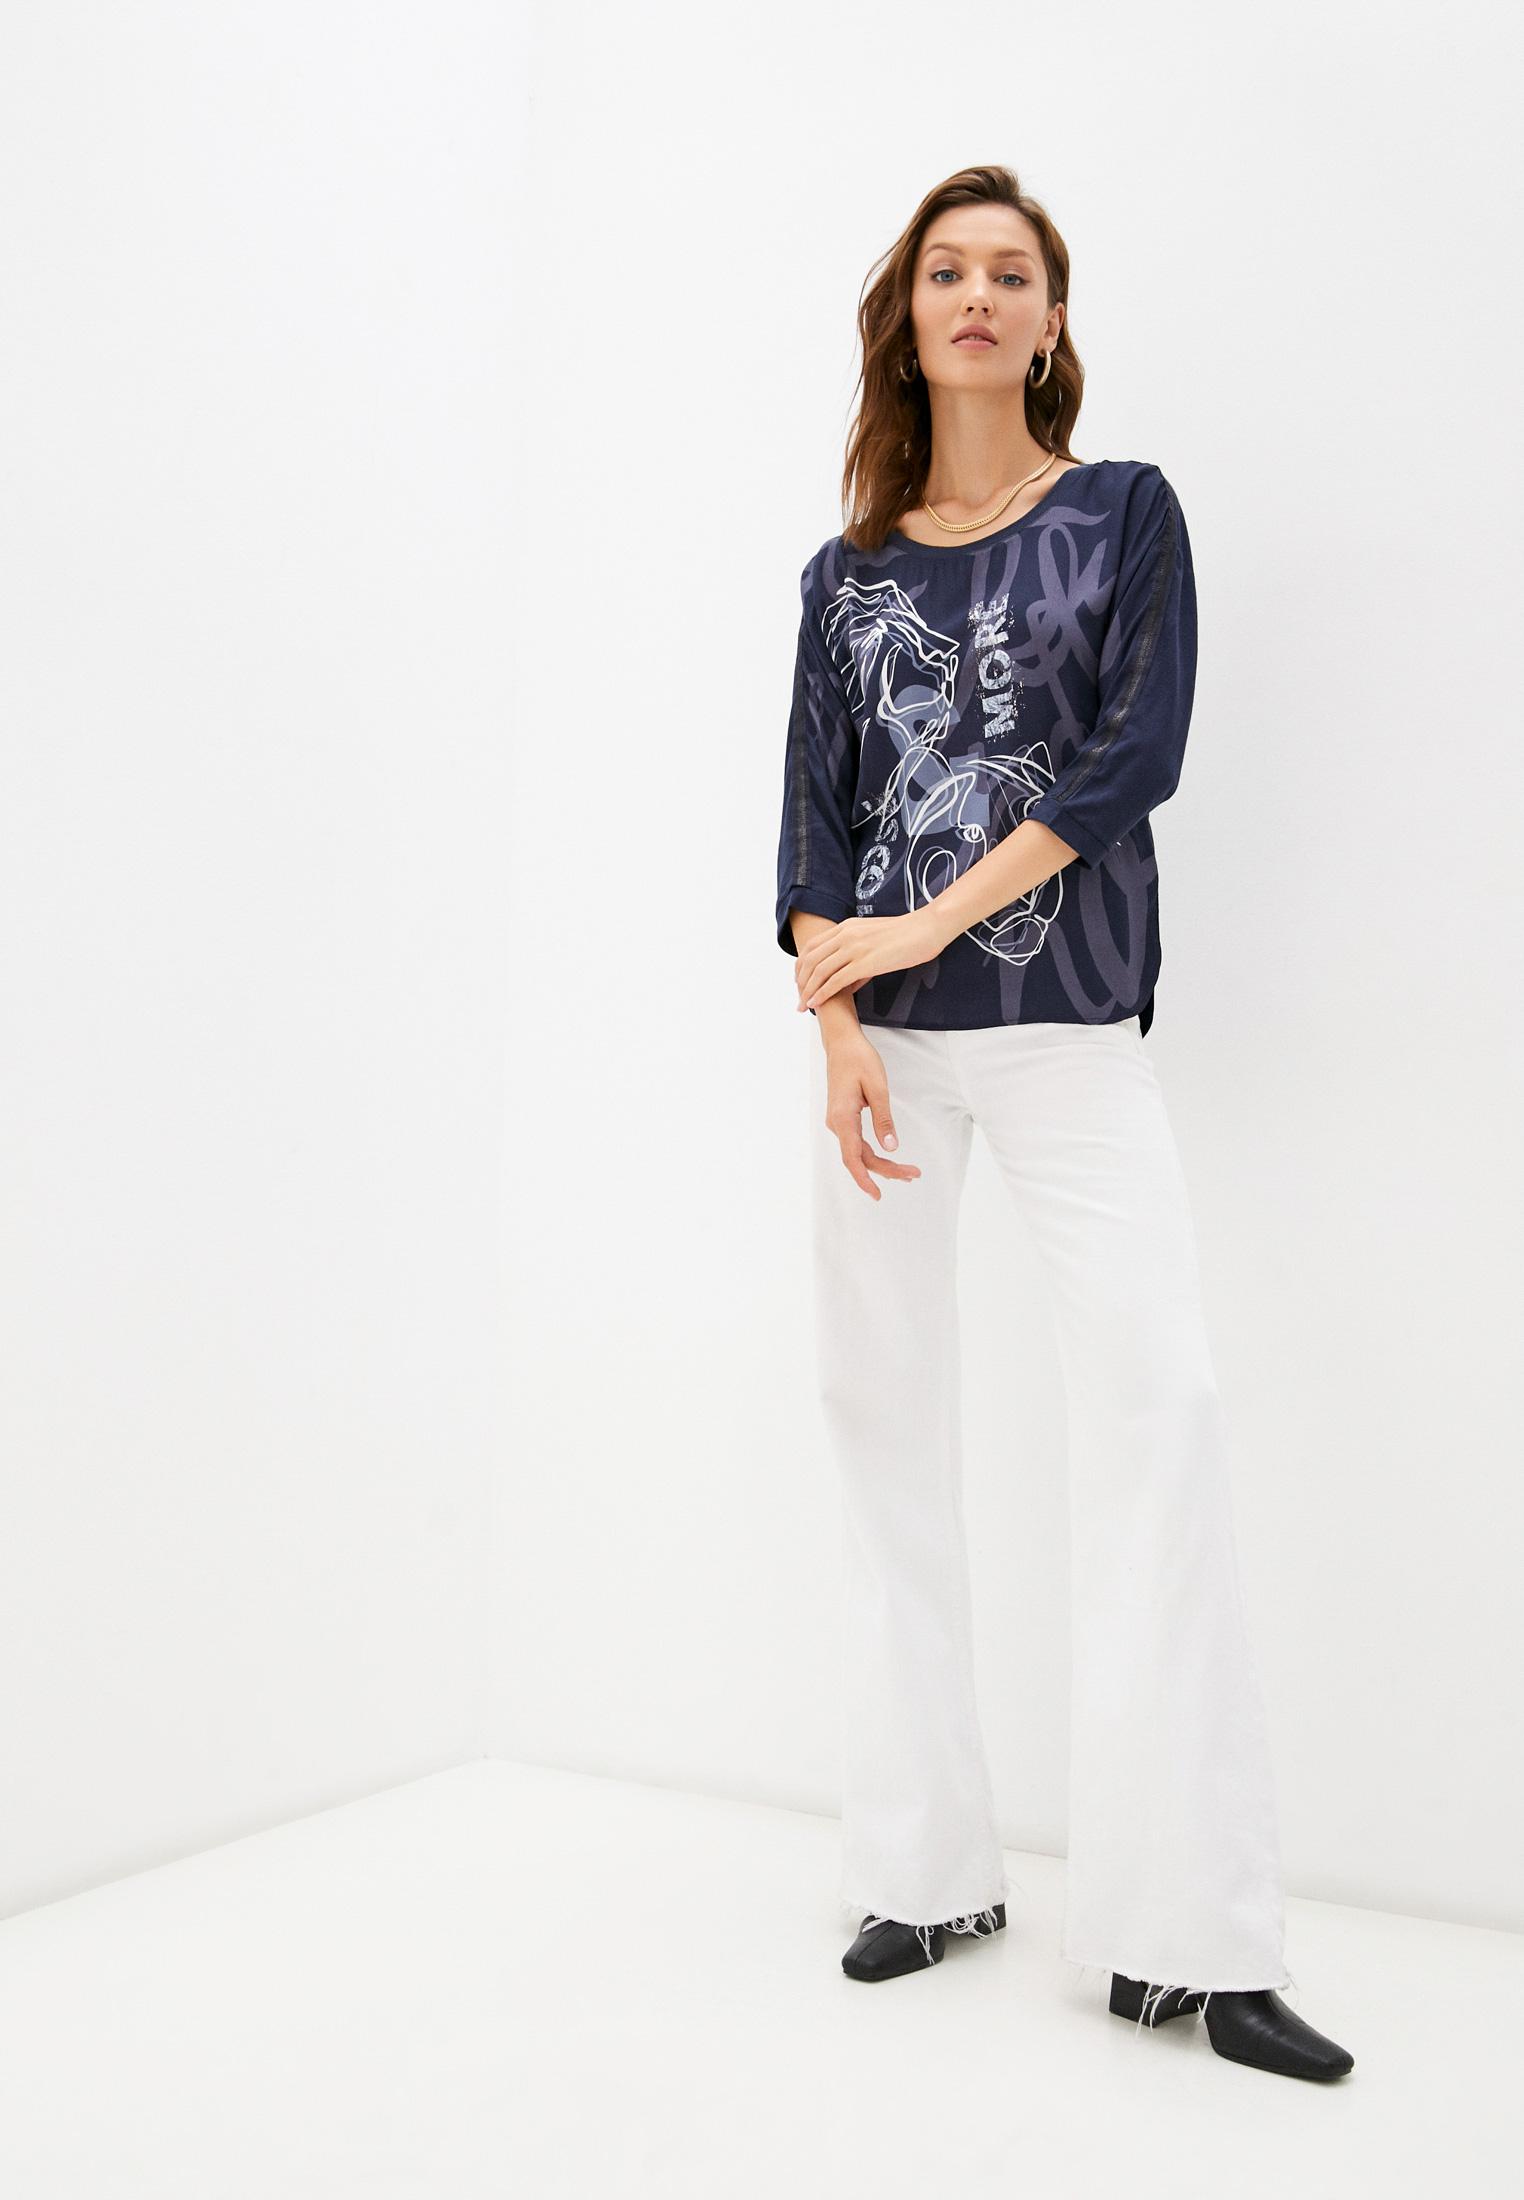 Блуза Betty & Co 2437/3219: изображение 2